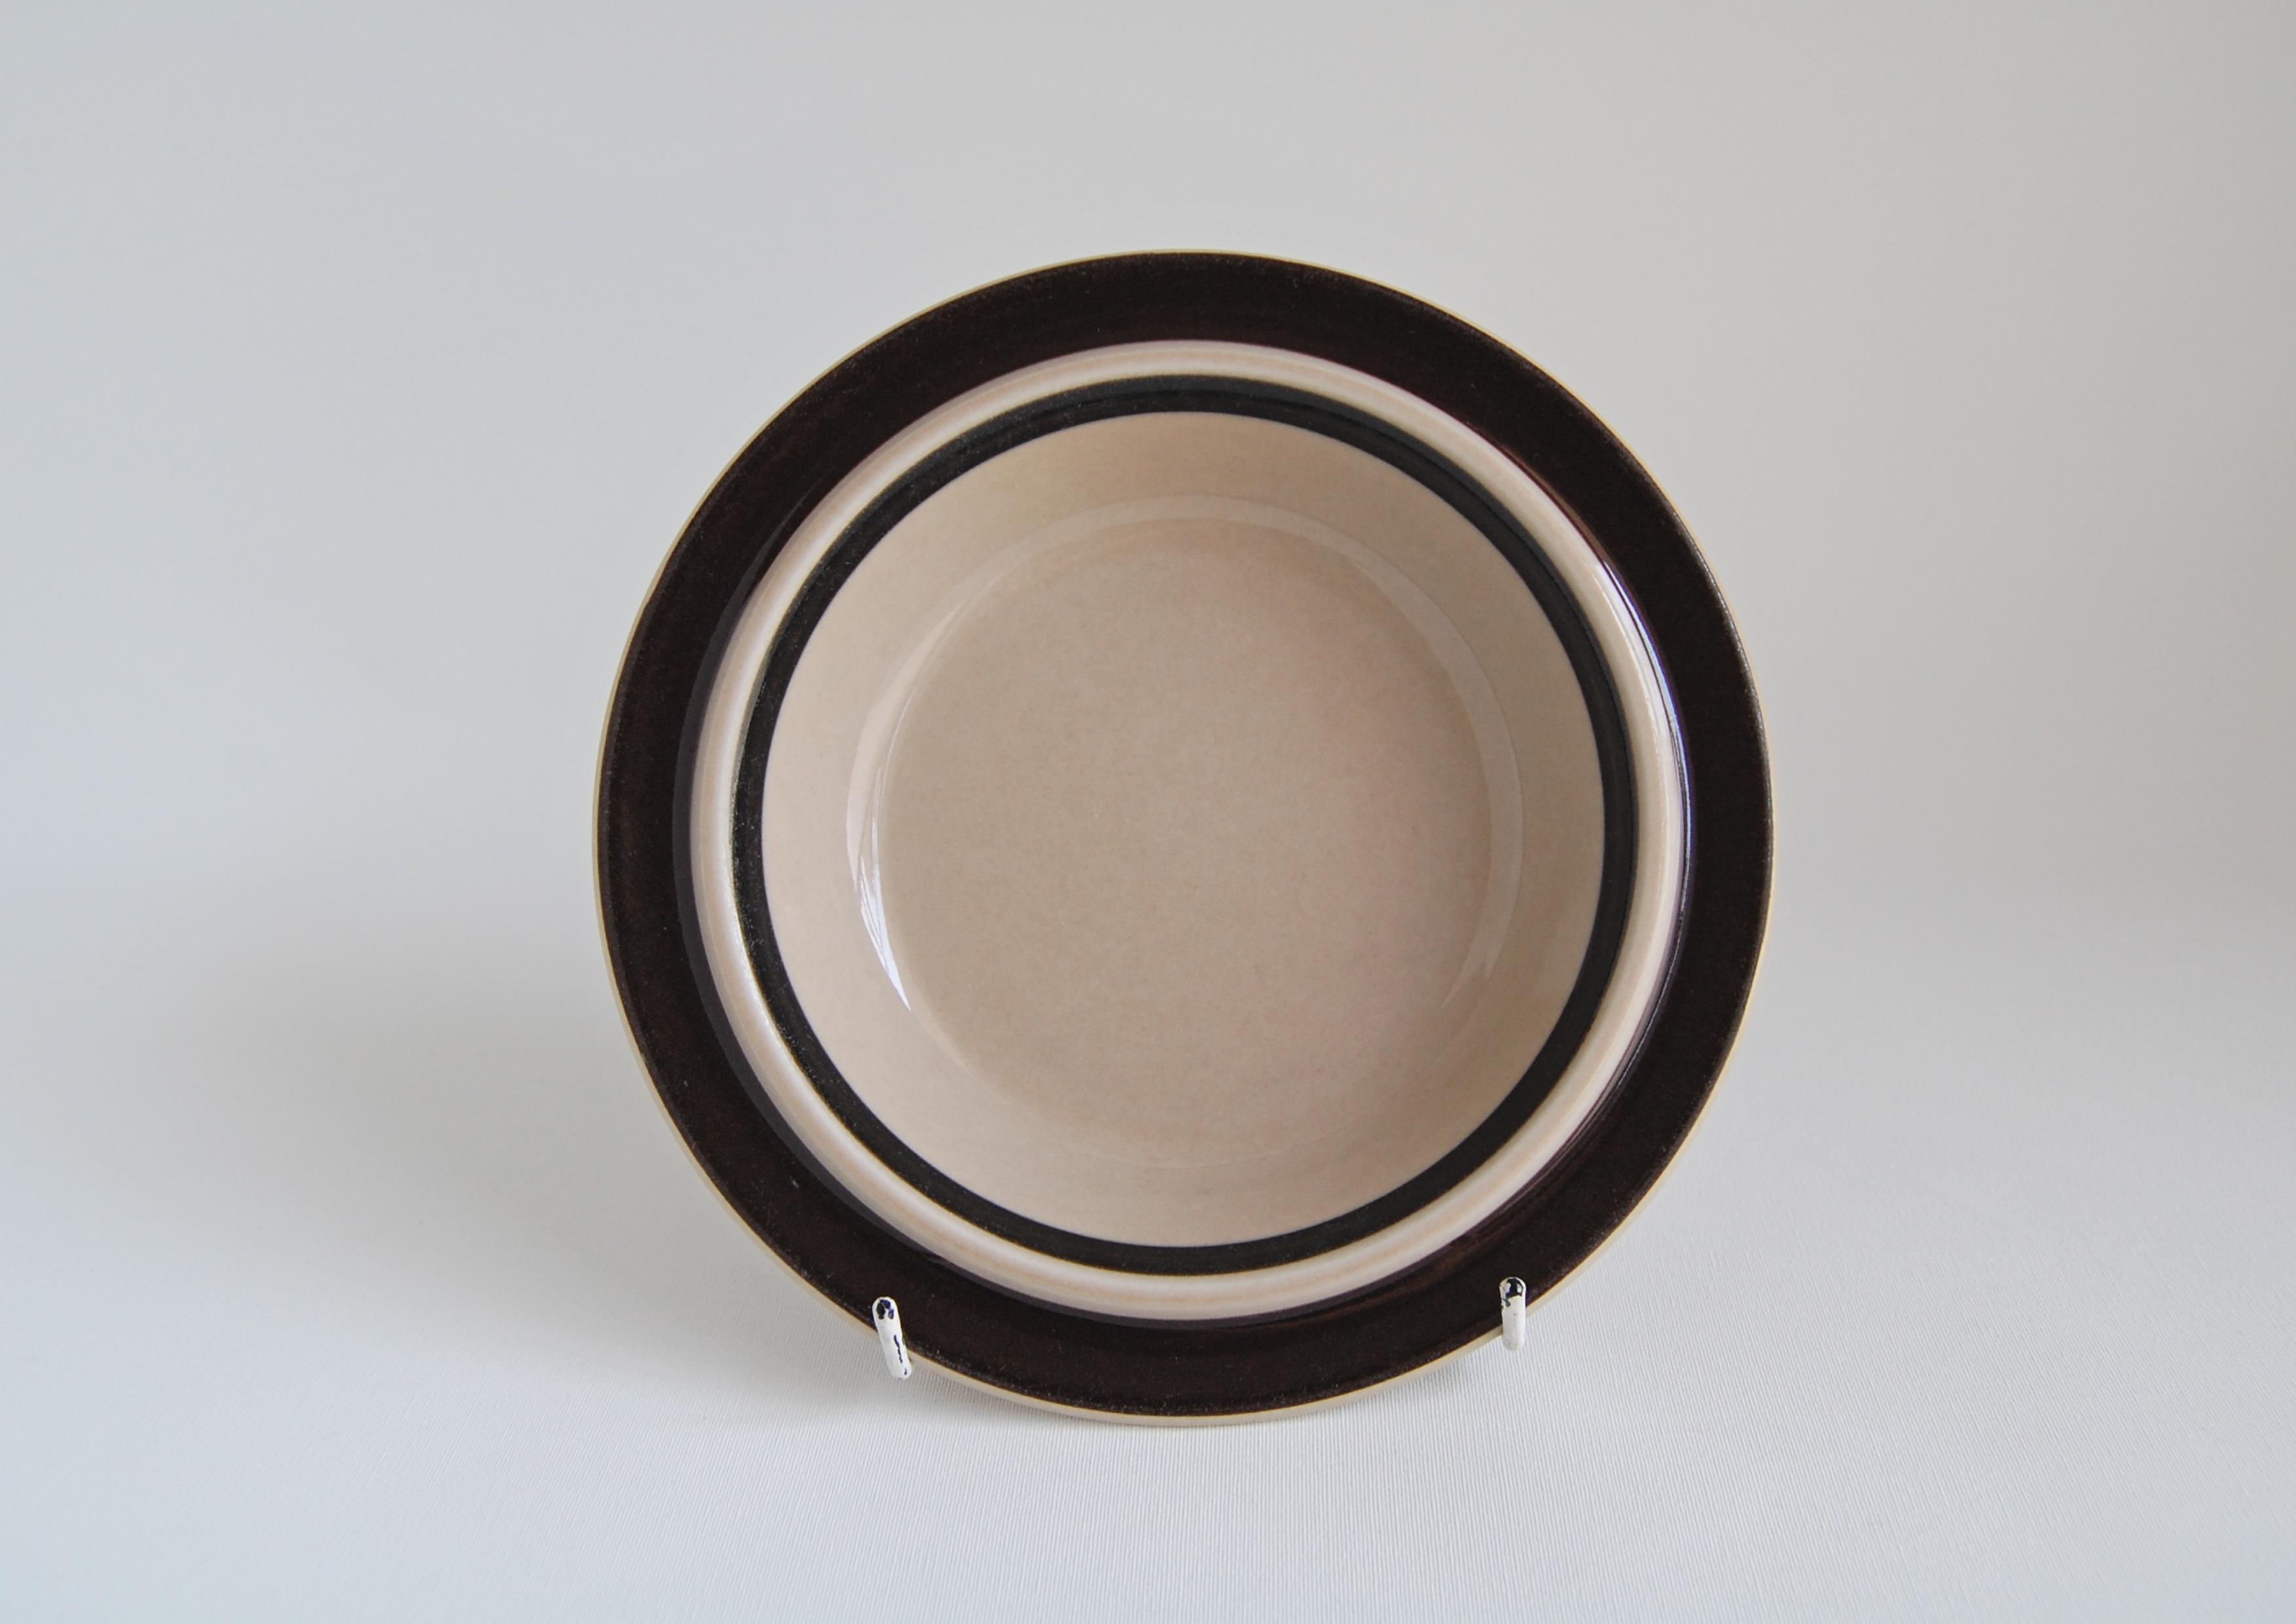 ARABIA/アラビア Ruija/ルイヤ 20cmスープボウル 001